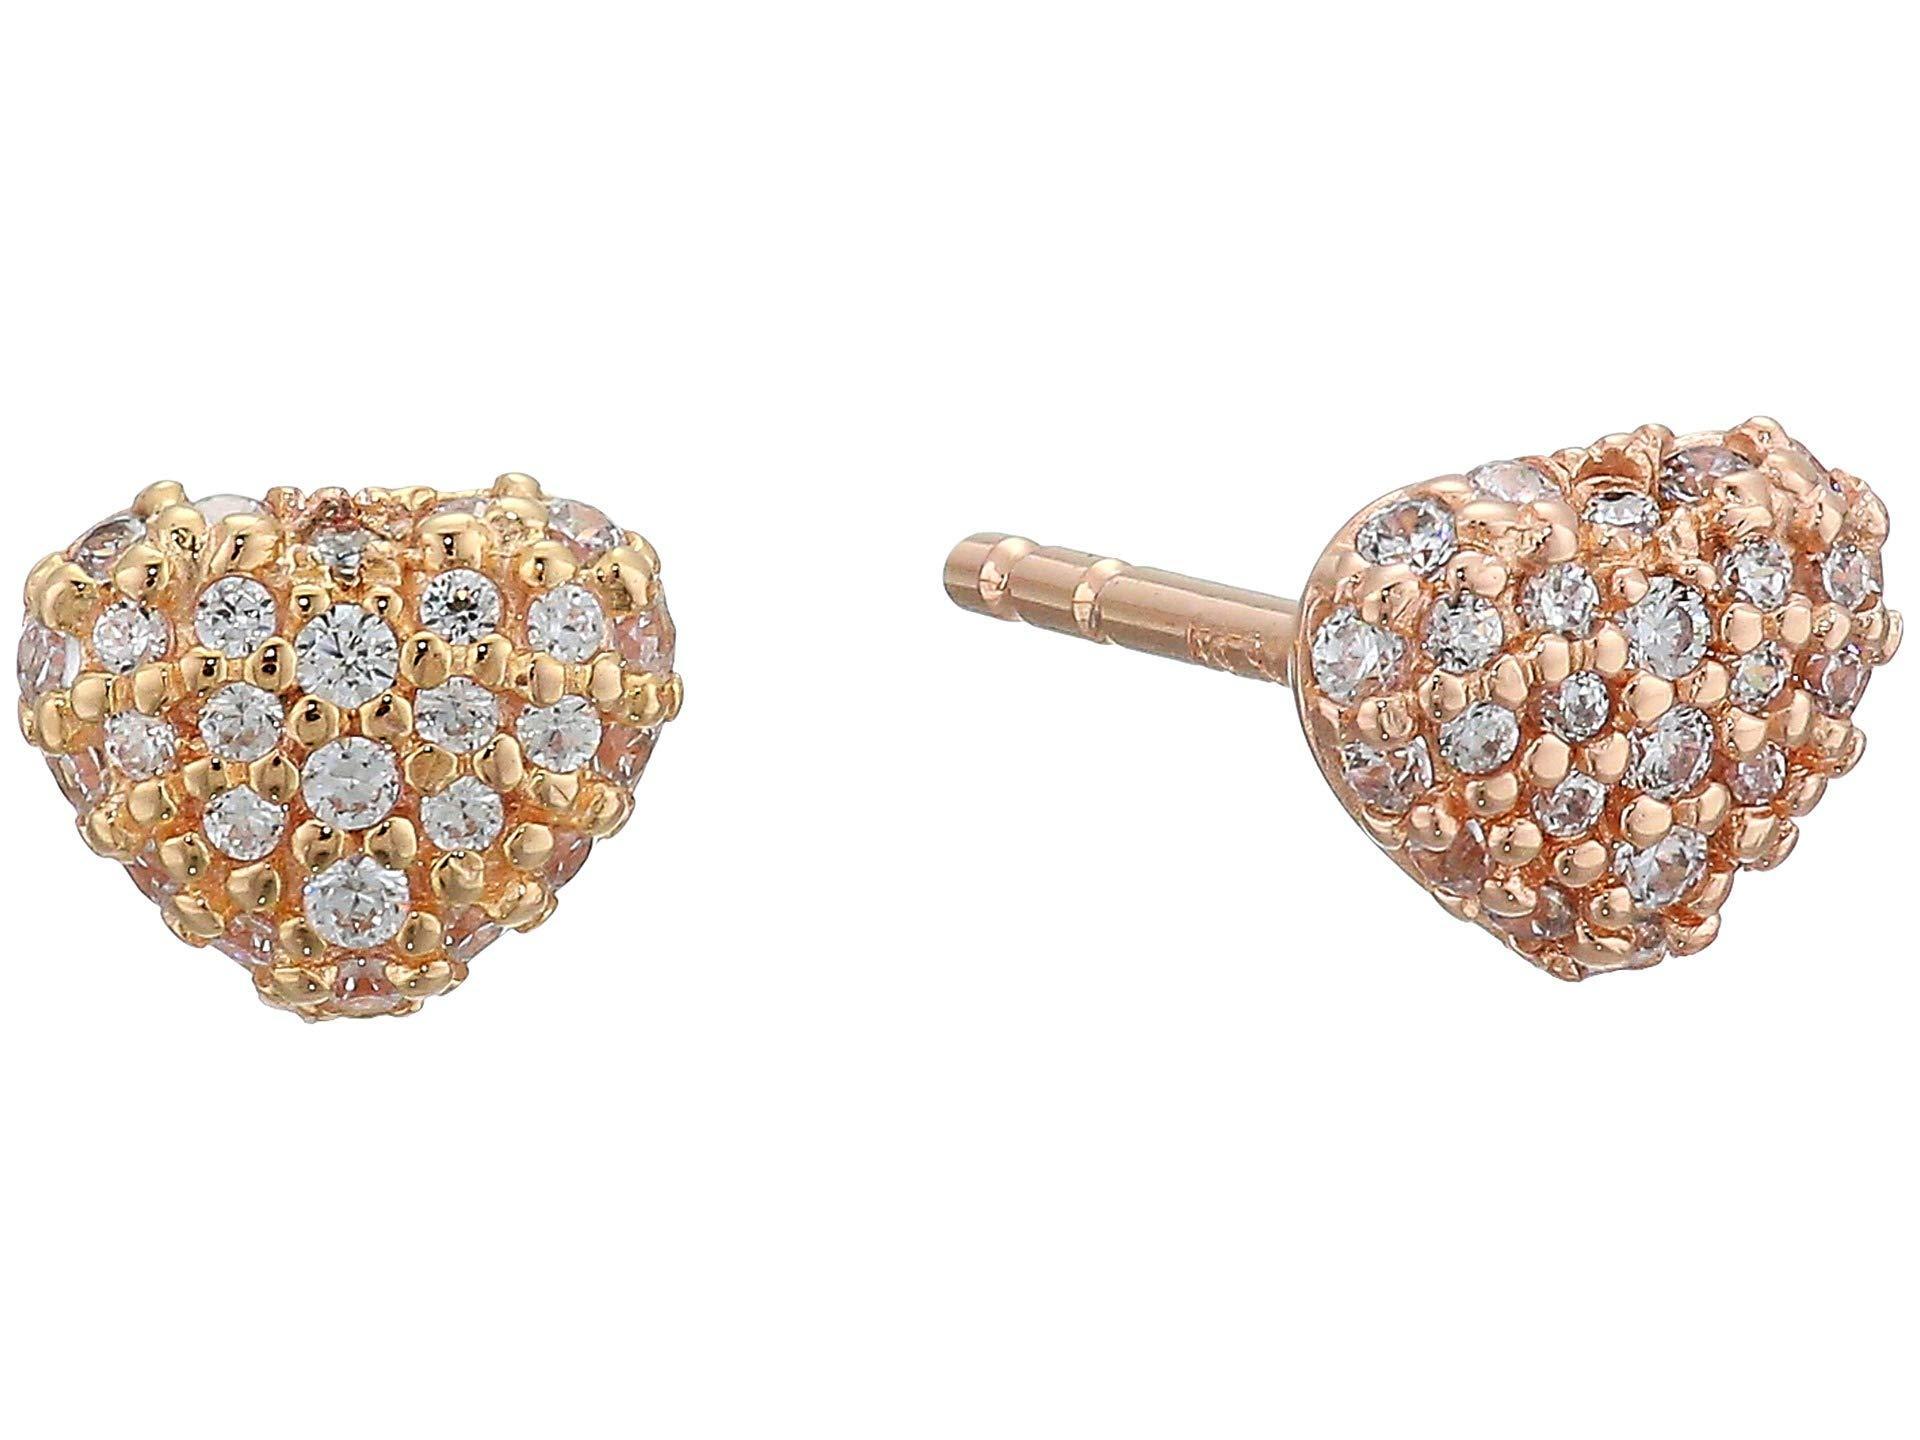 857ee33cd11dcf Michael Kors. Women's Metallic Precious Metal-plated Sterling Silver Pave  Heart Studs Earrings ...